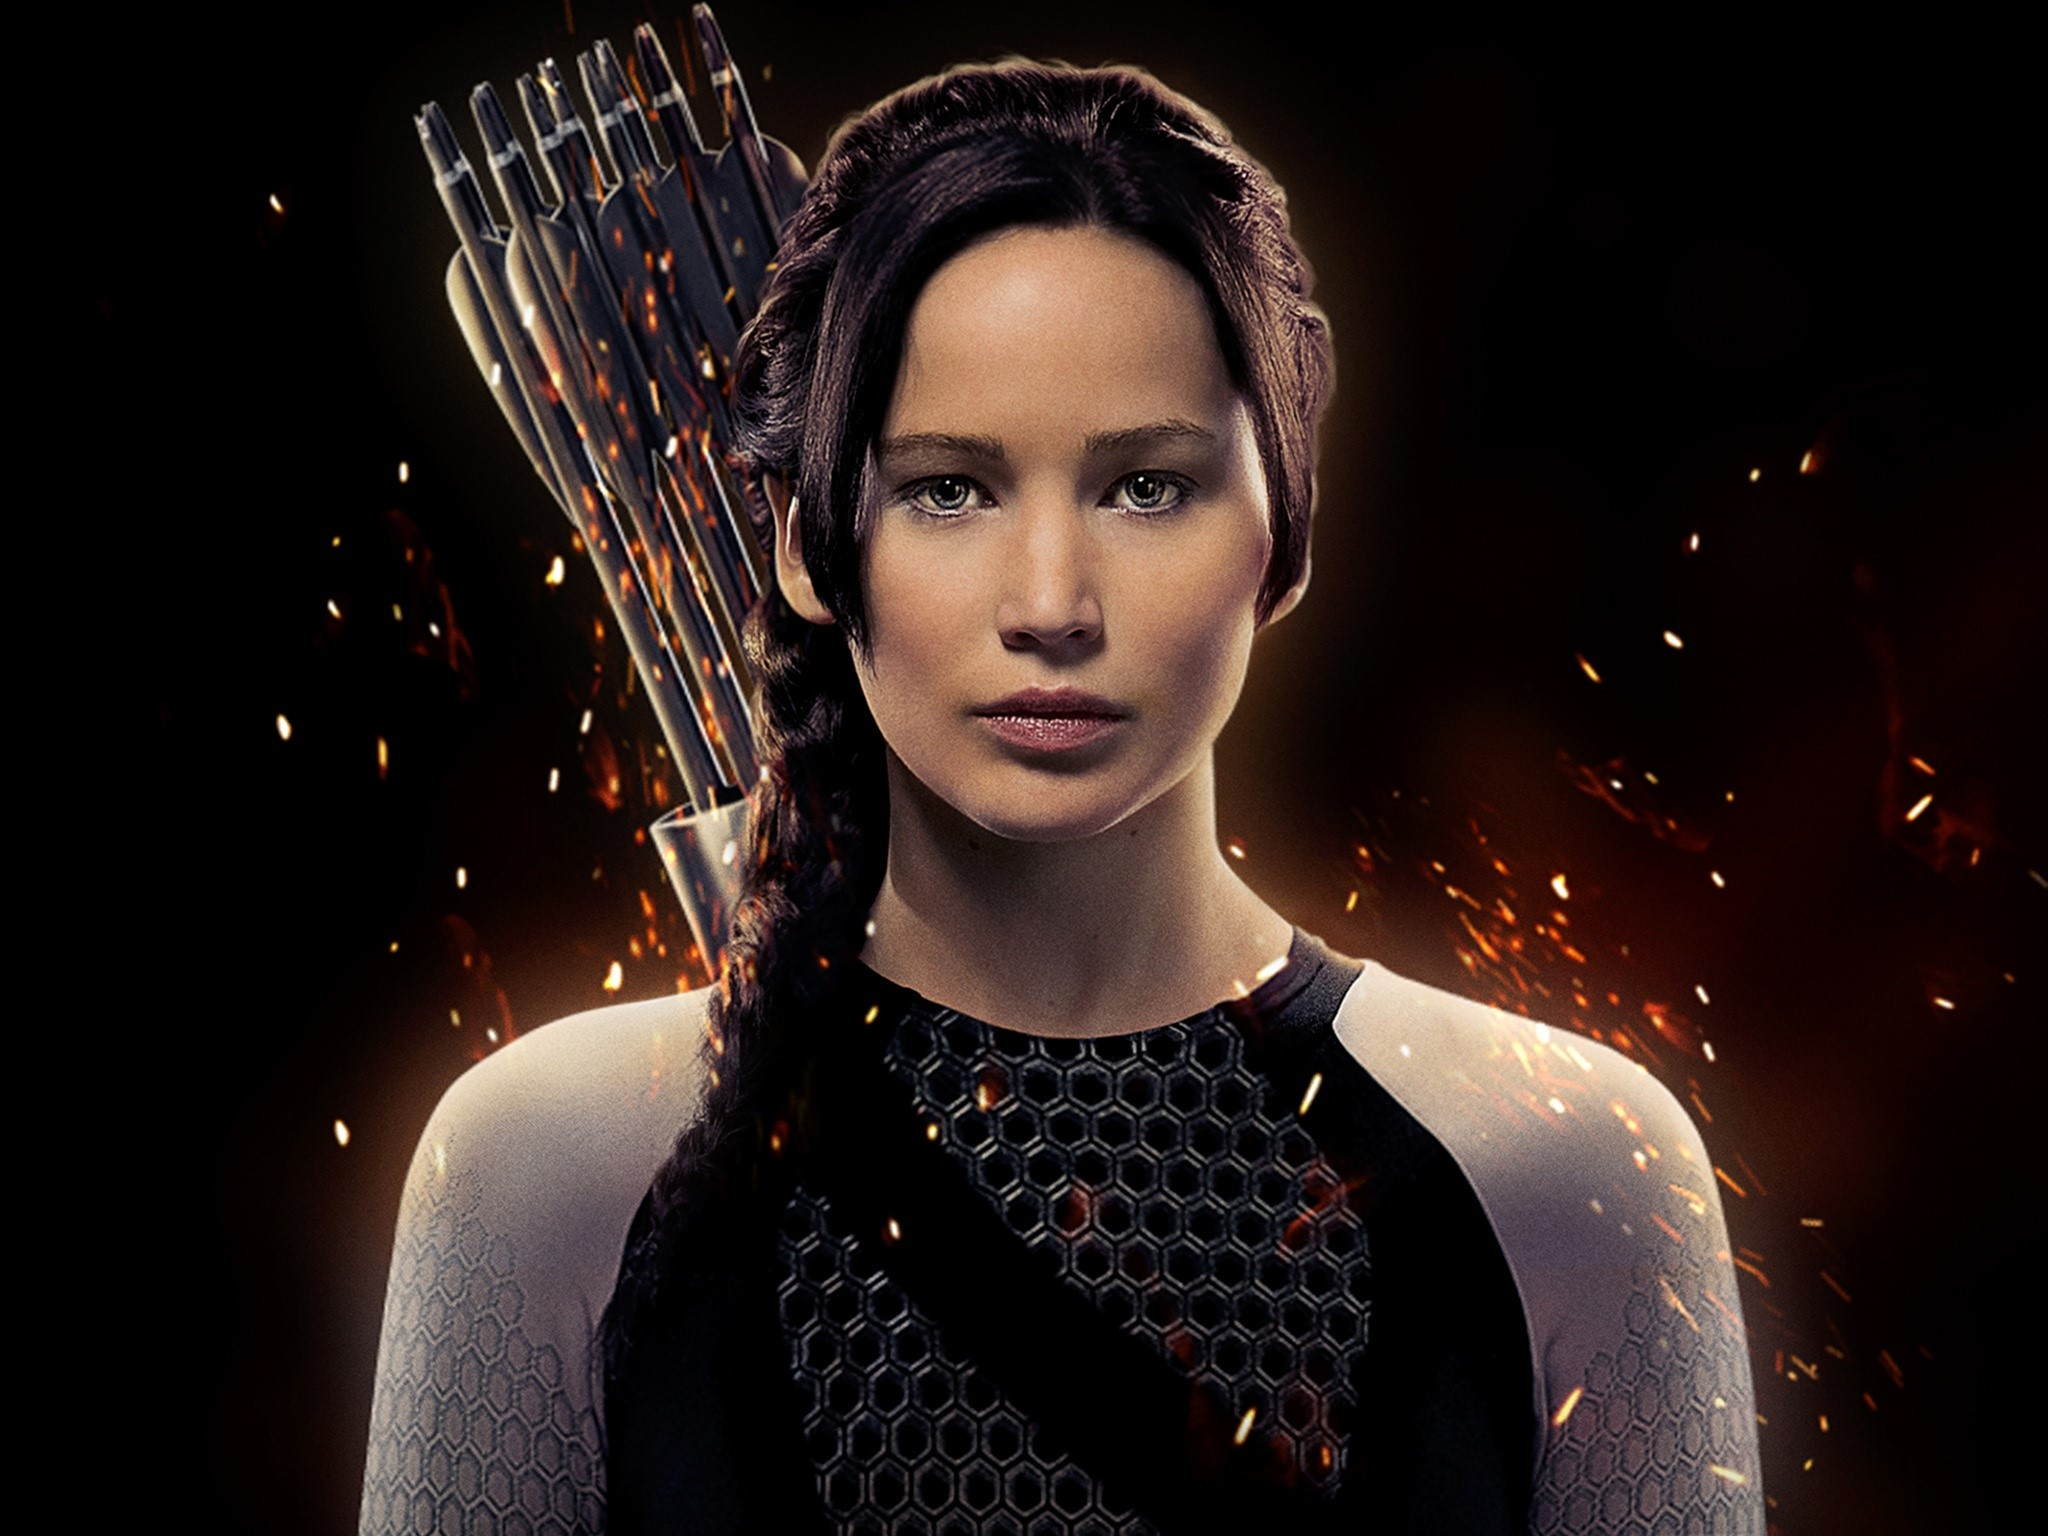 Fondos de pantalla Jennifer Lawrence como Katniss